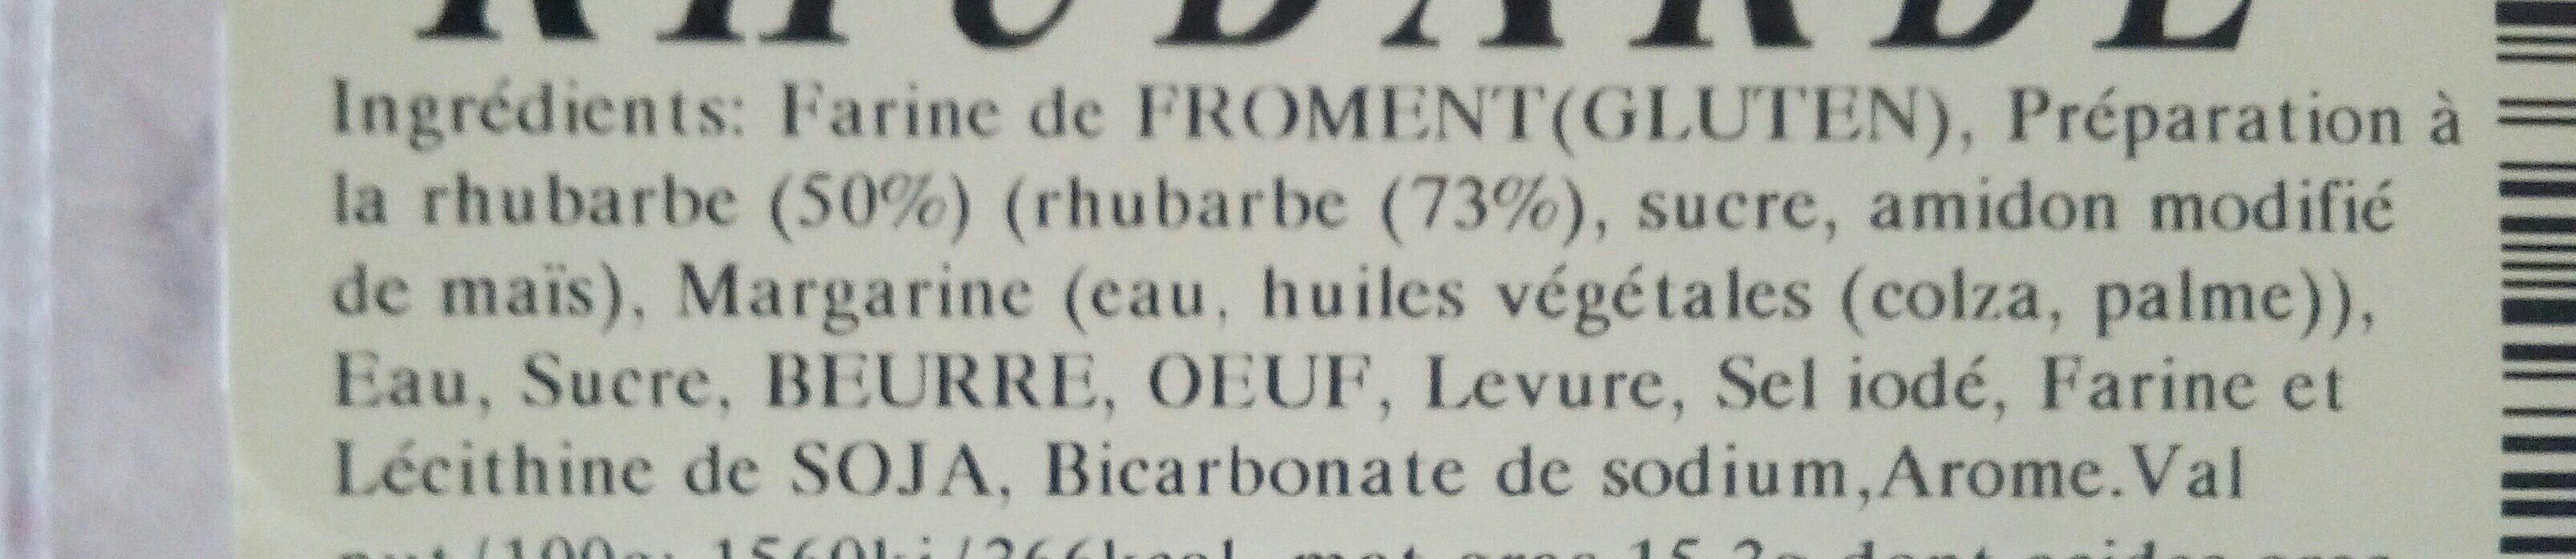 Gaufres Rhubarbe - Ingrediënten